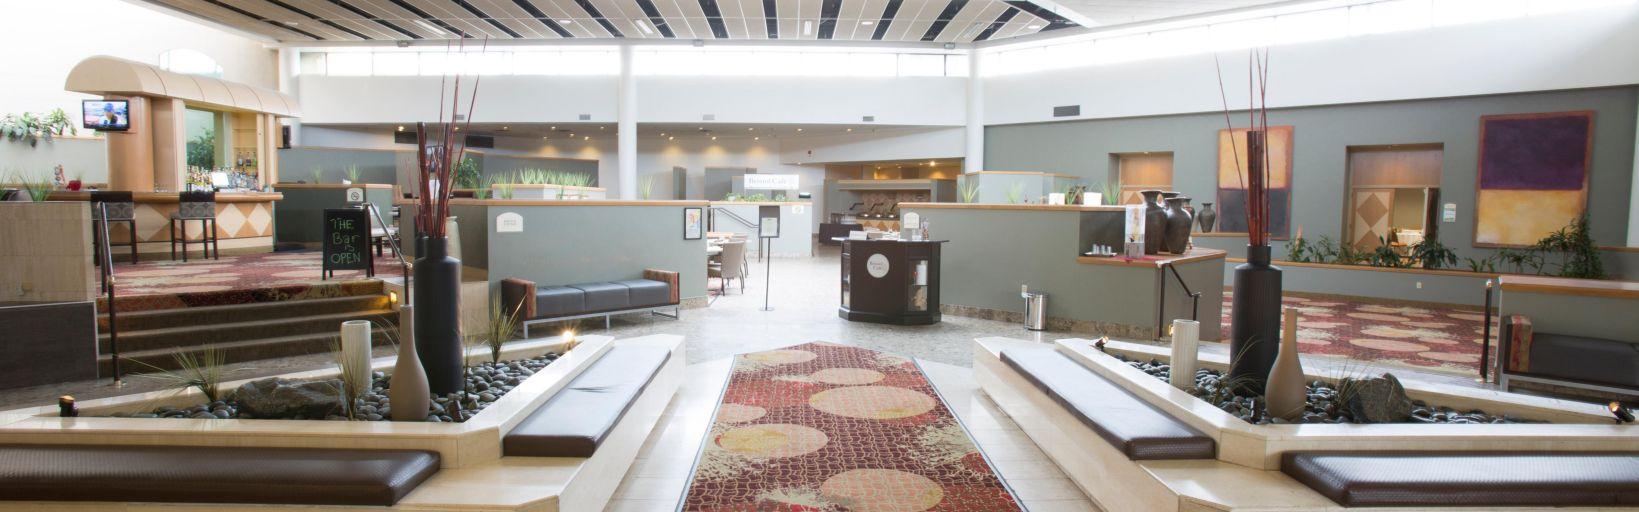 holiday inn orlando international airport hotel by ihg